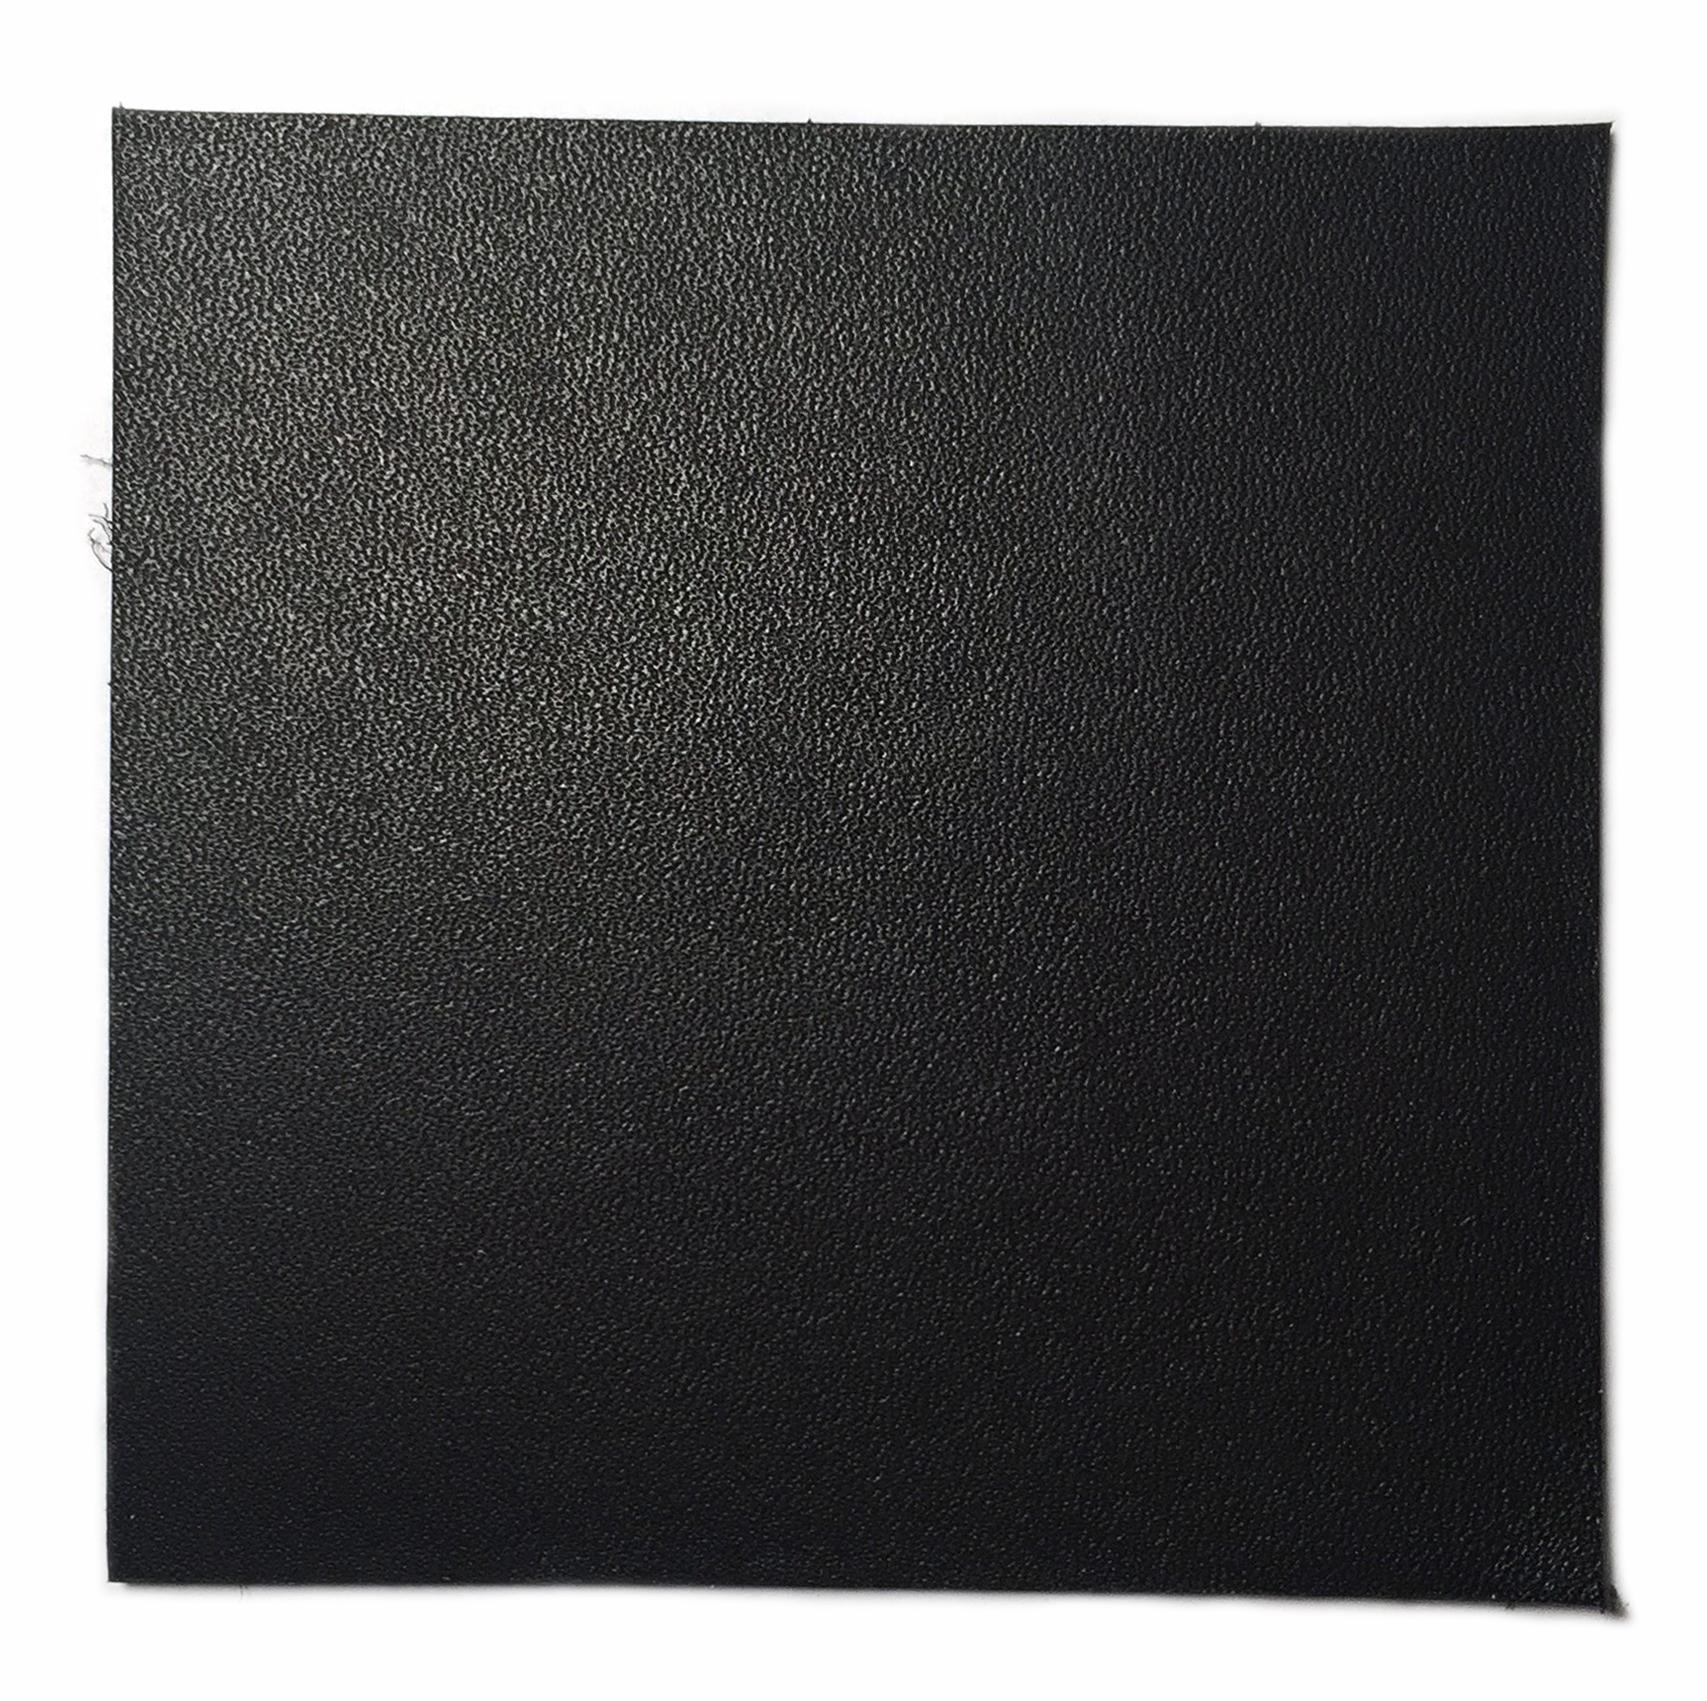 Leather_Black2.jpg